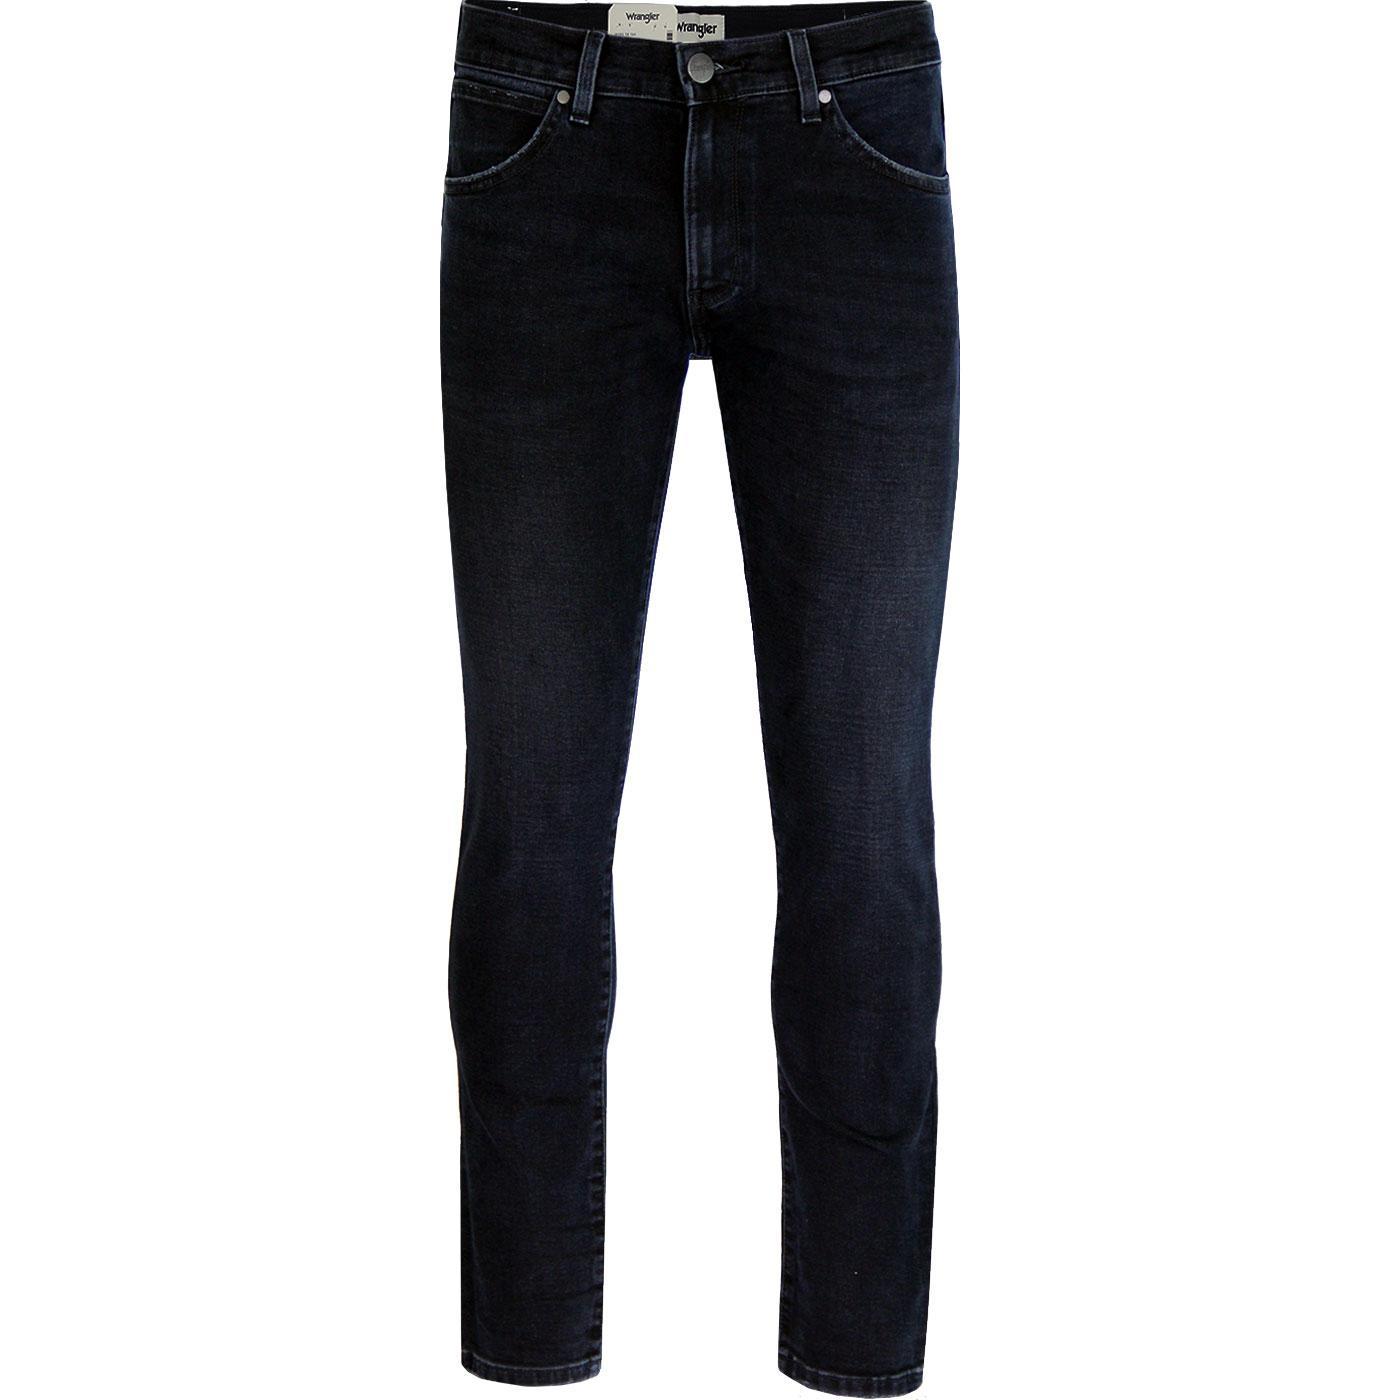 Larston WRANGLER Slim Tapered Brushed Denim Jeans